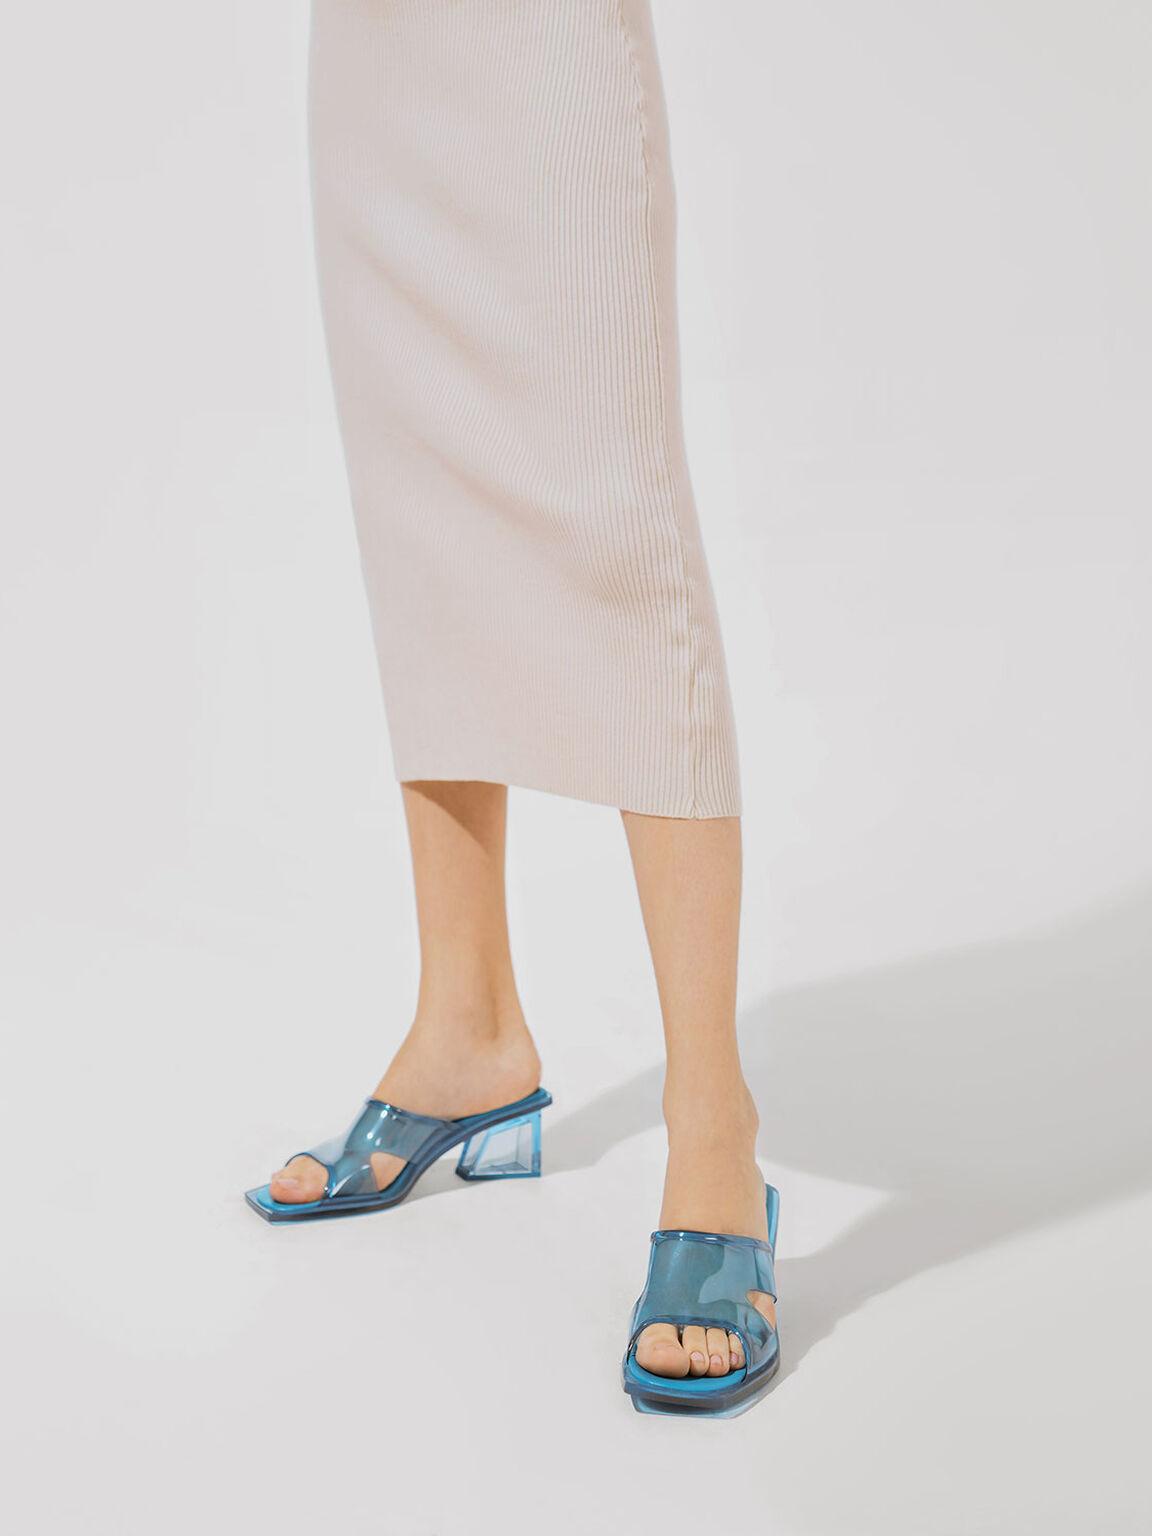 Acrylic Heel Mules, Teal, hi-res